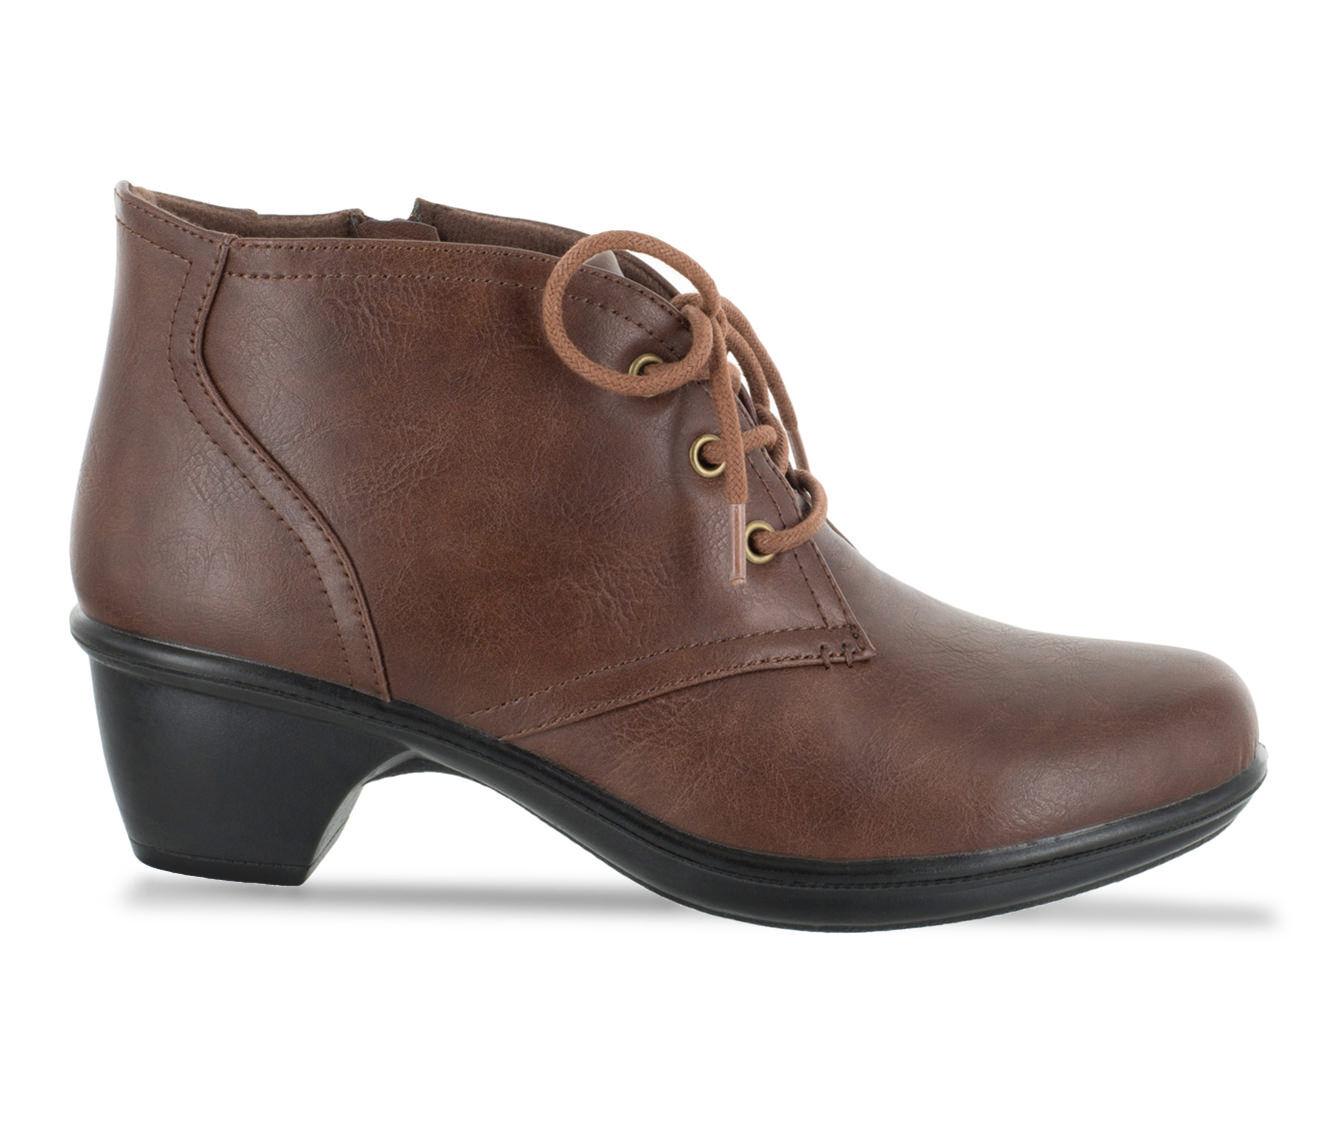 Women's Easy Street Debbie Shoes Mid Brown